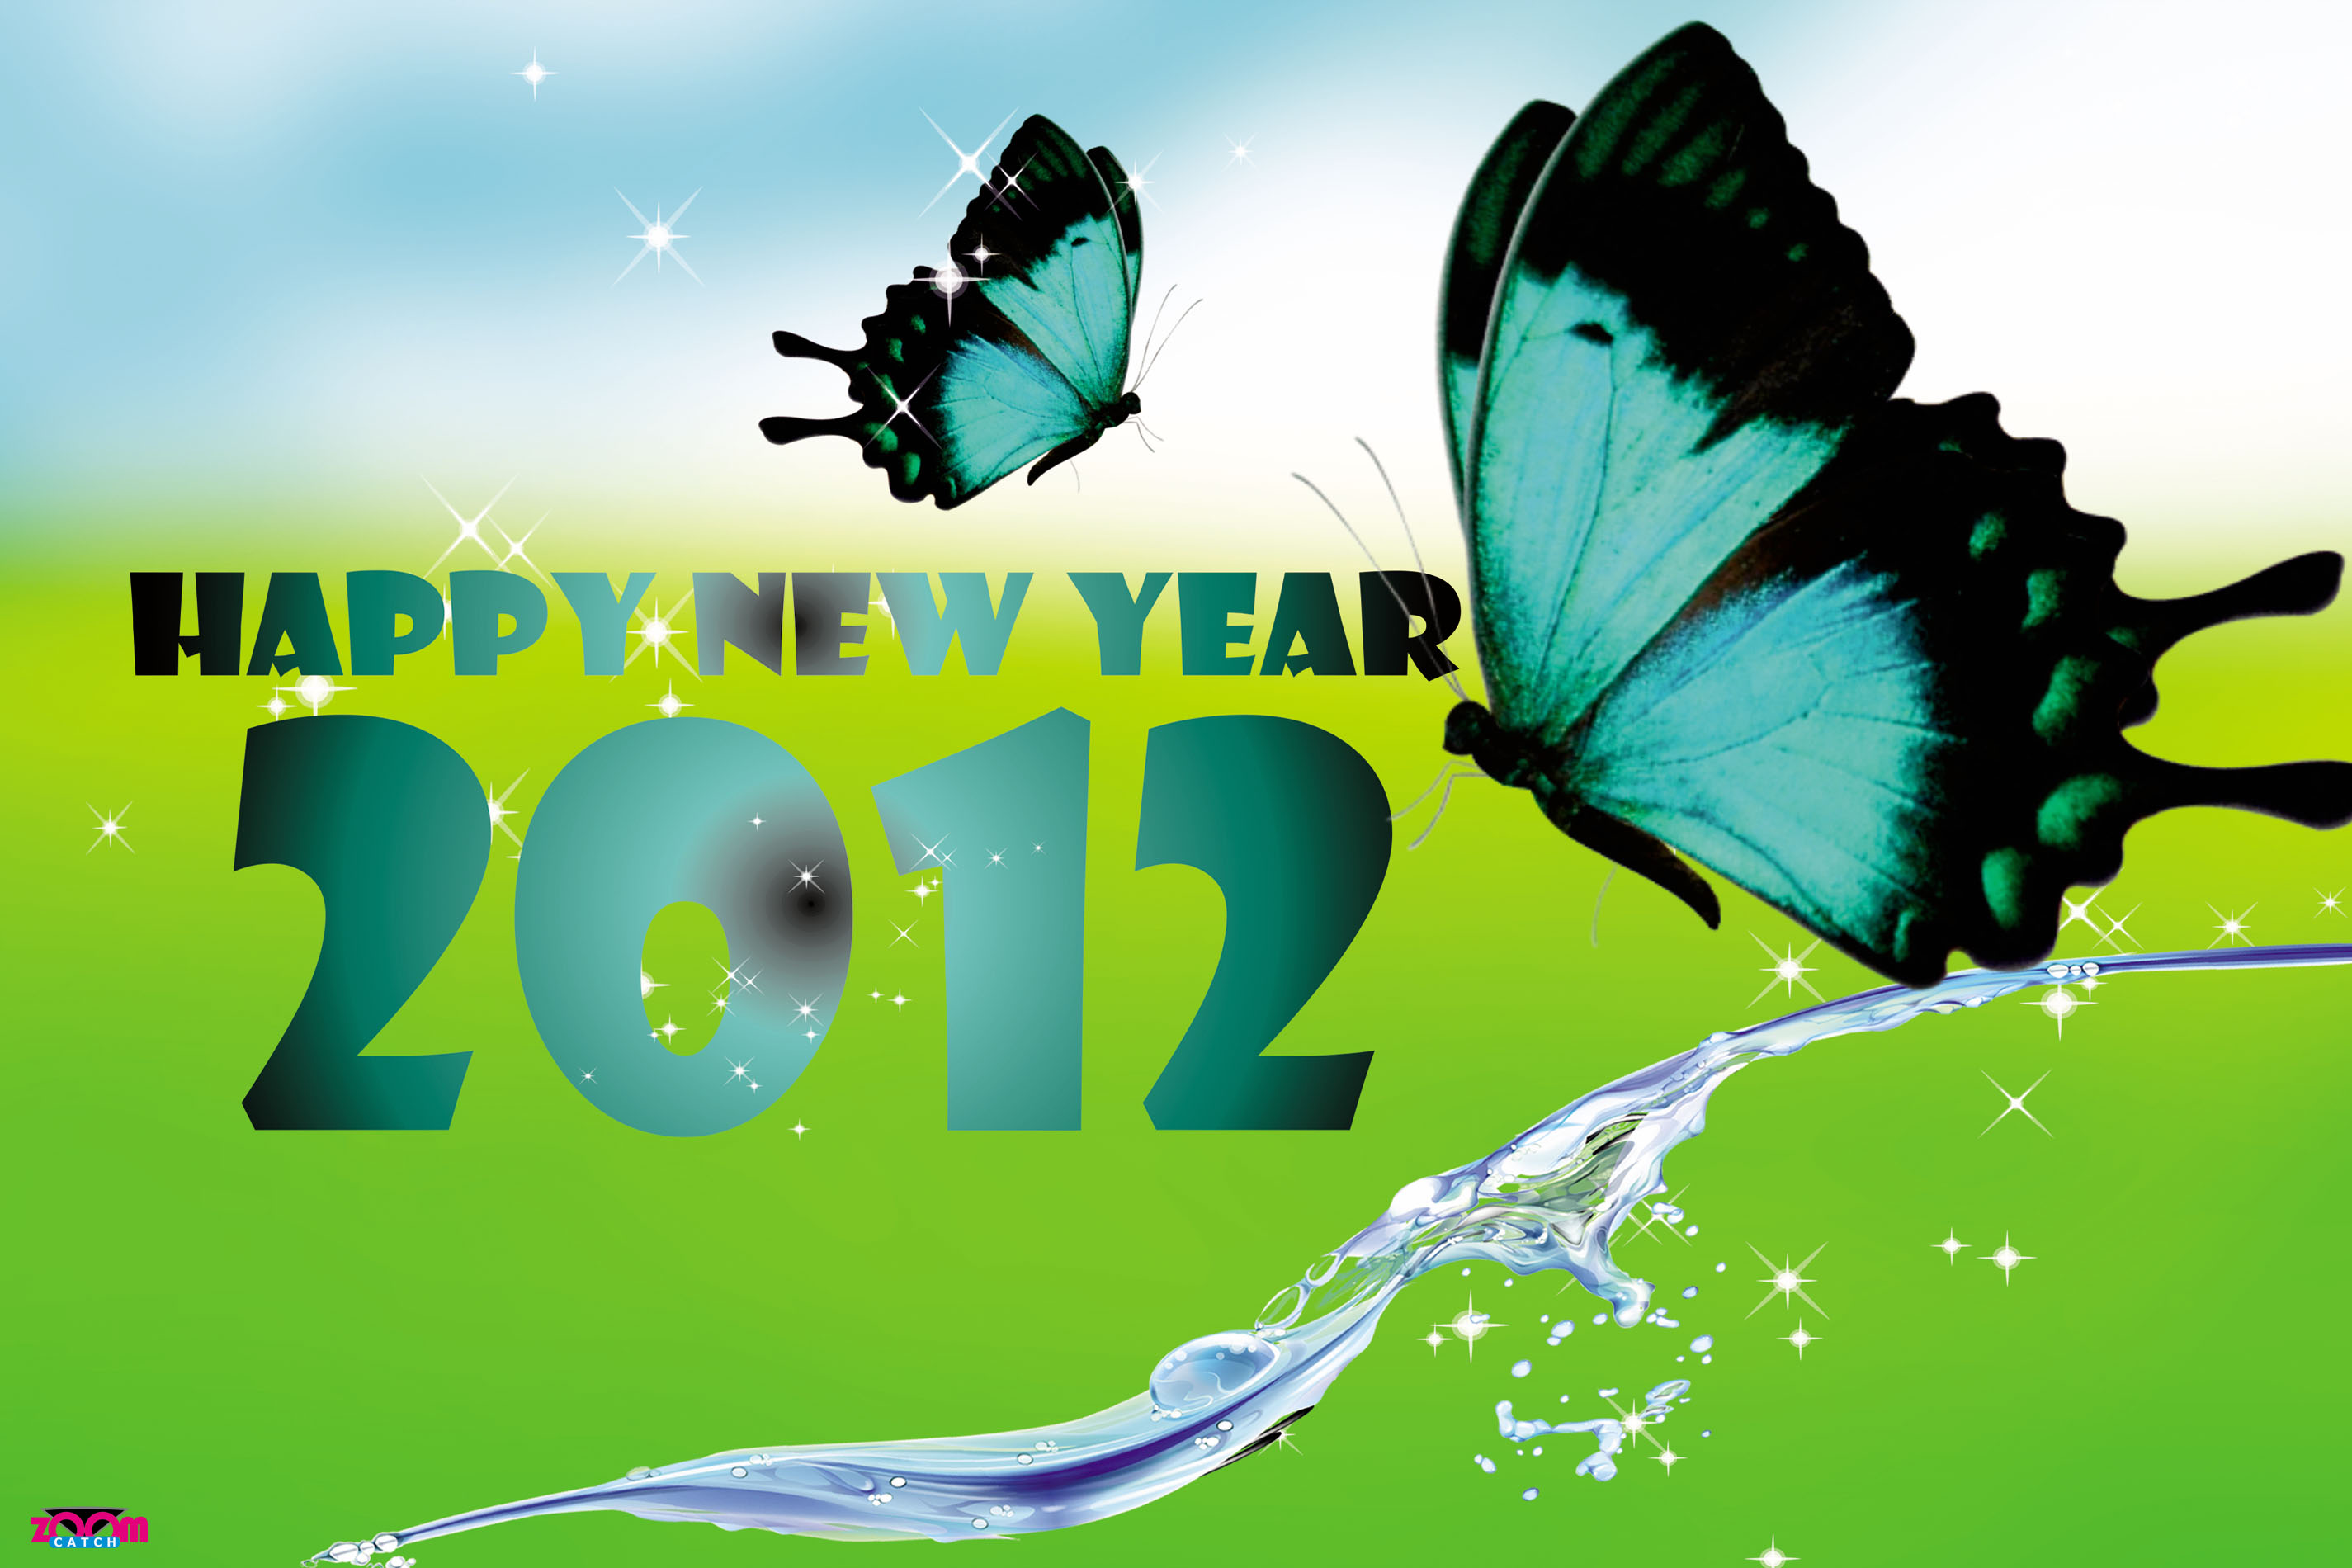 Beautiful New Year 2012 Graphic